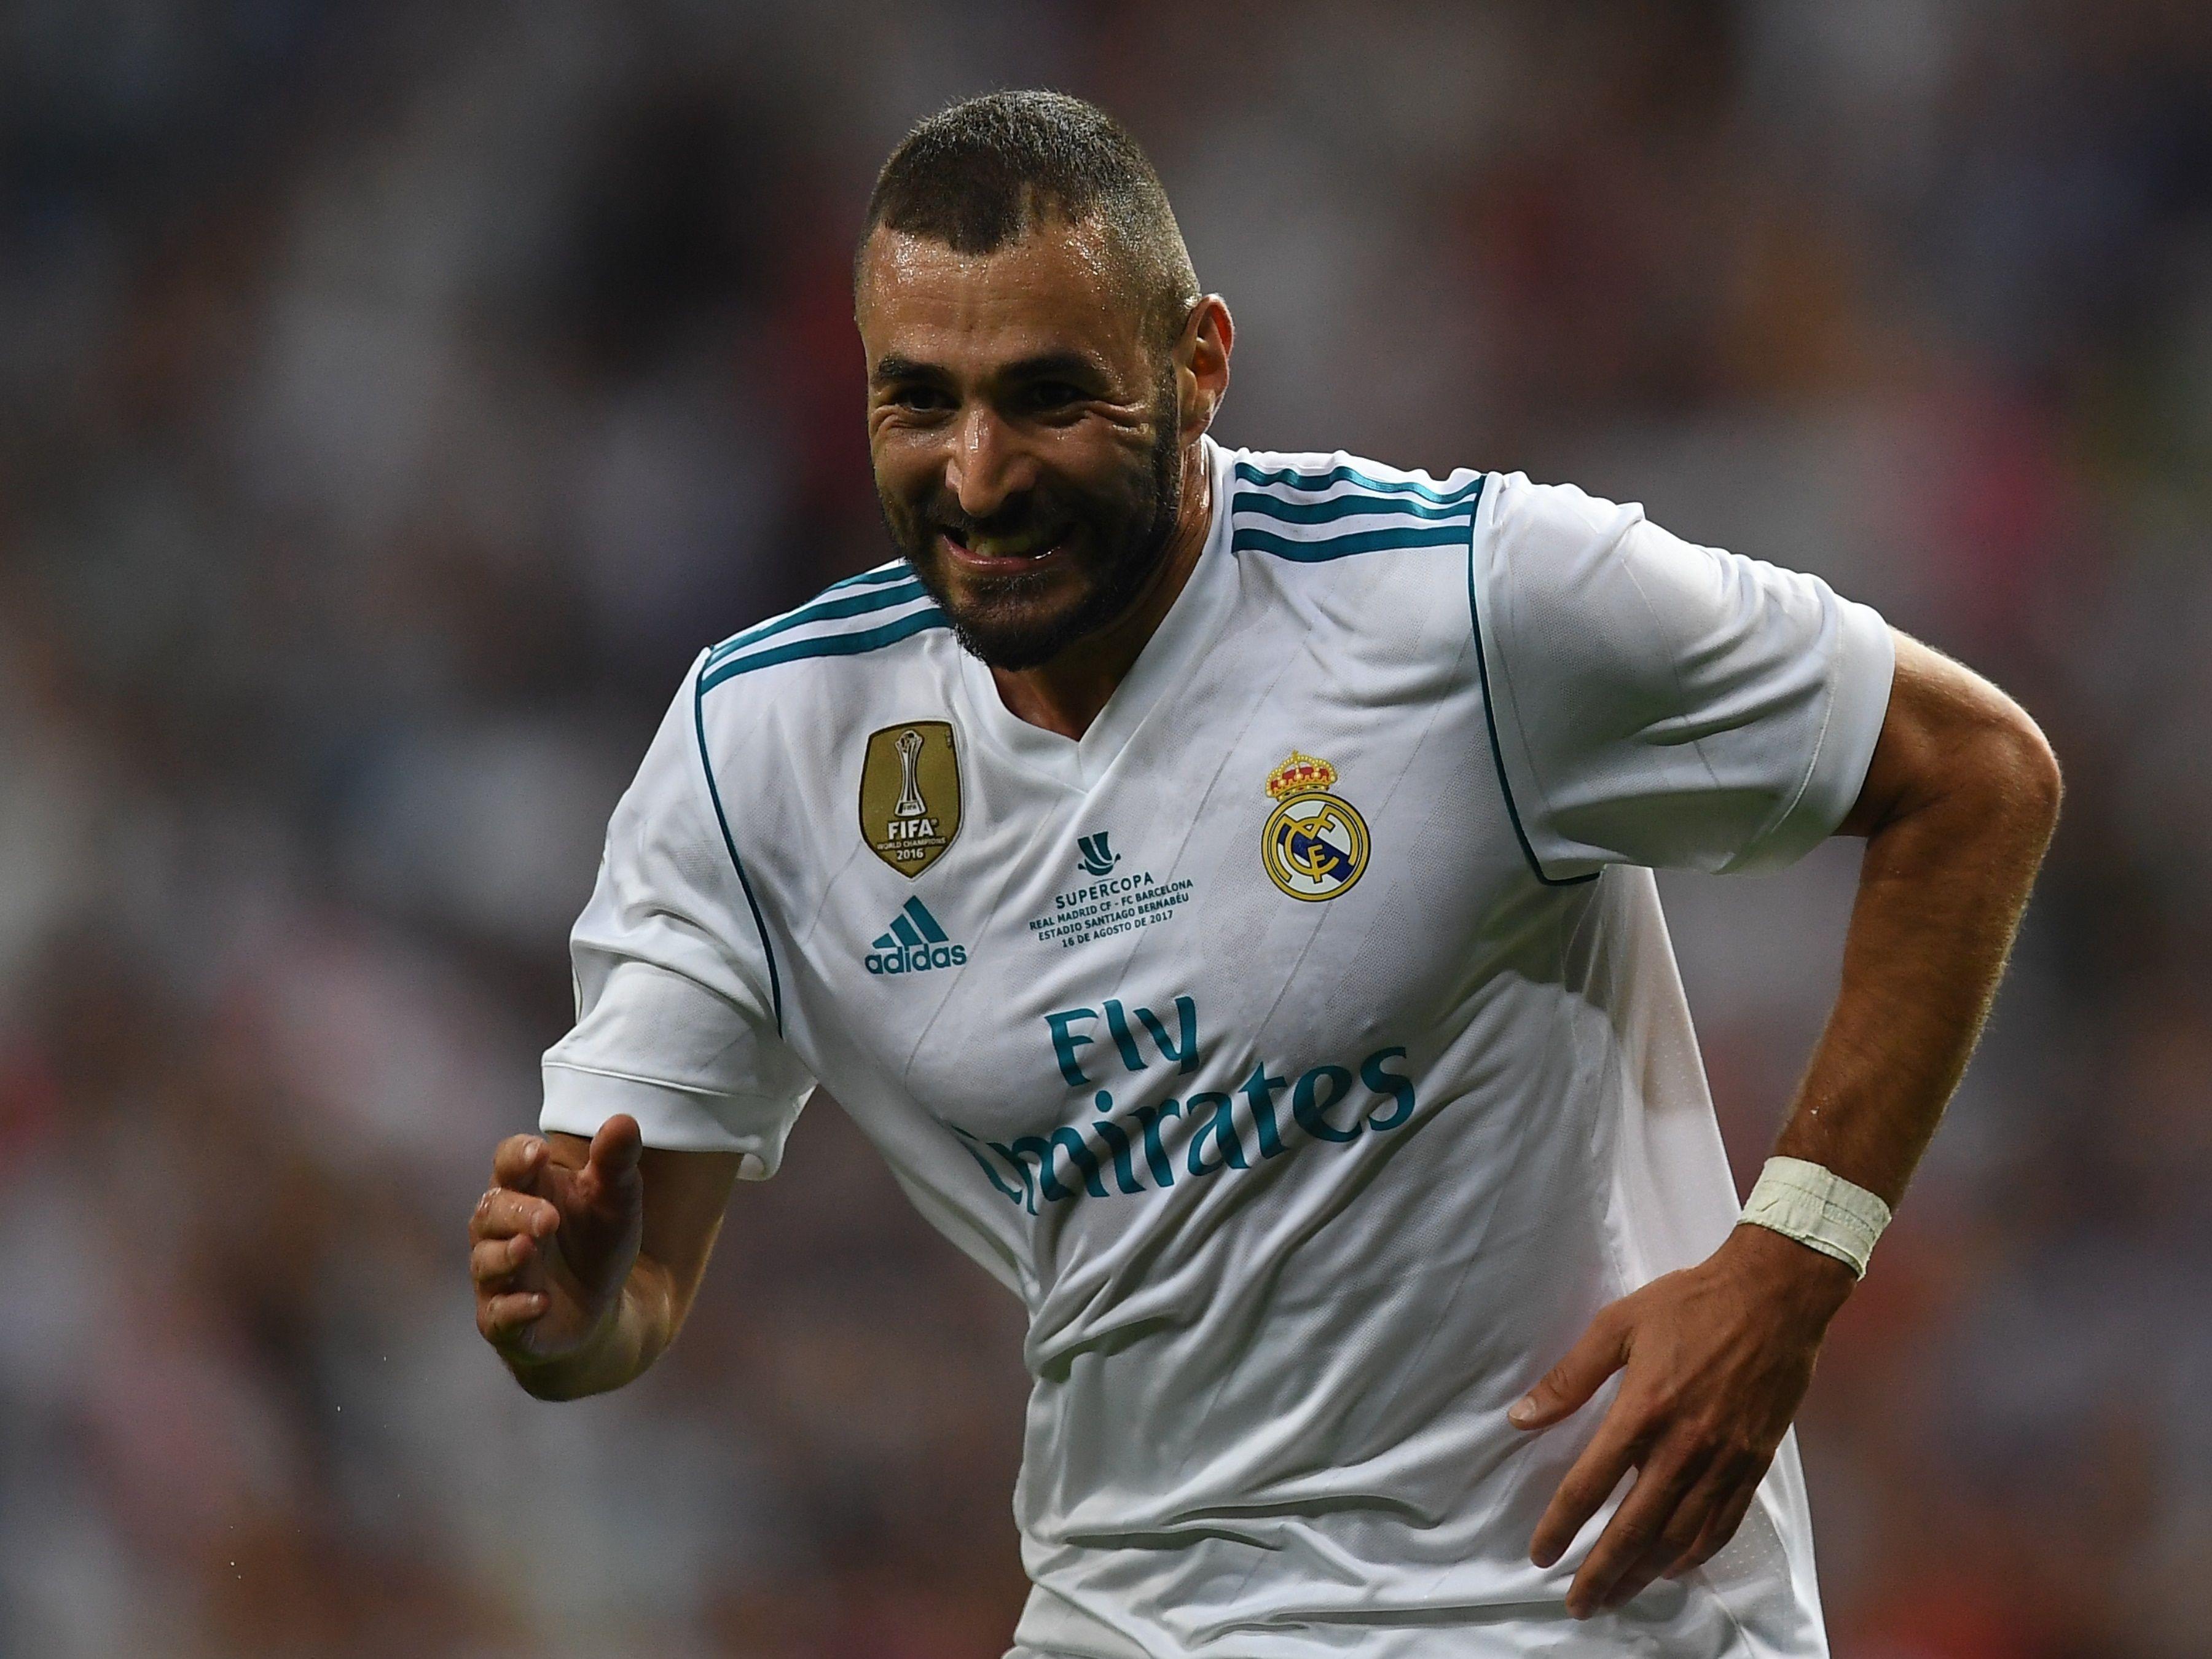 Hier Wird Real Madrid Gegen Tottenham Hotspur Gezeigt Live Stream